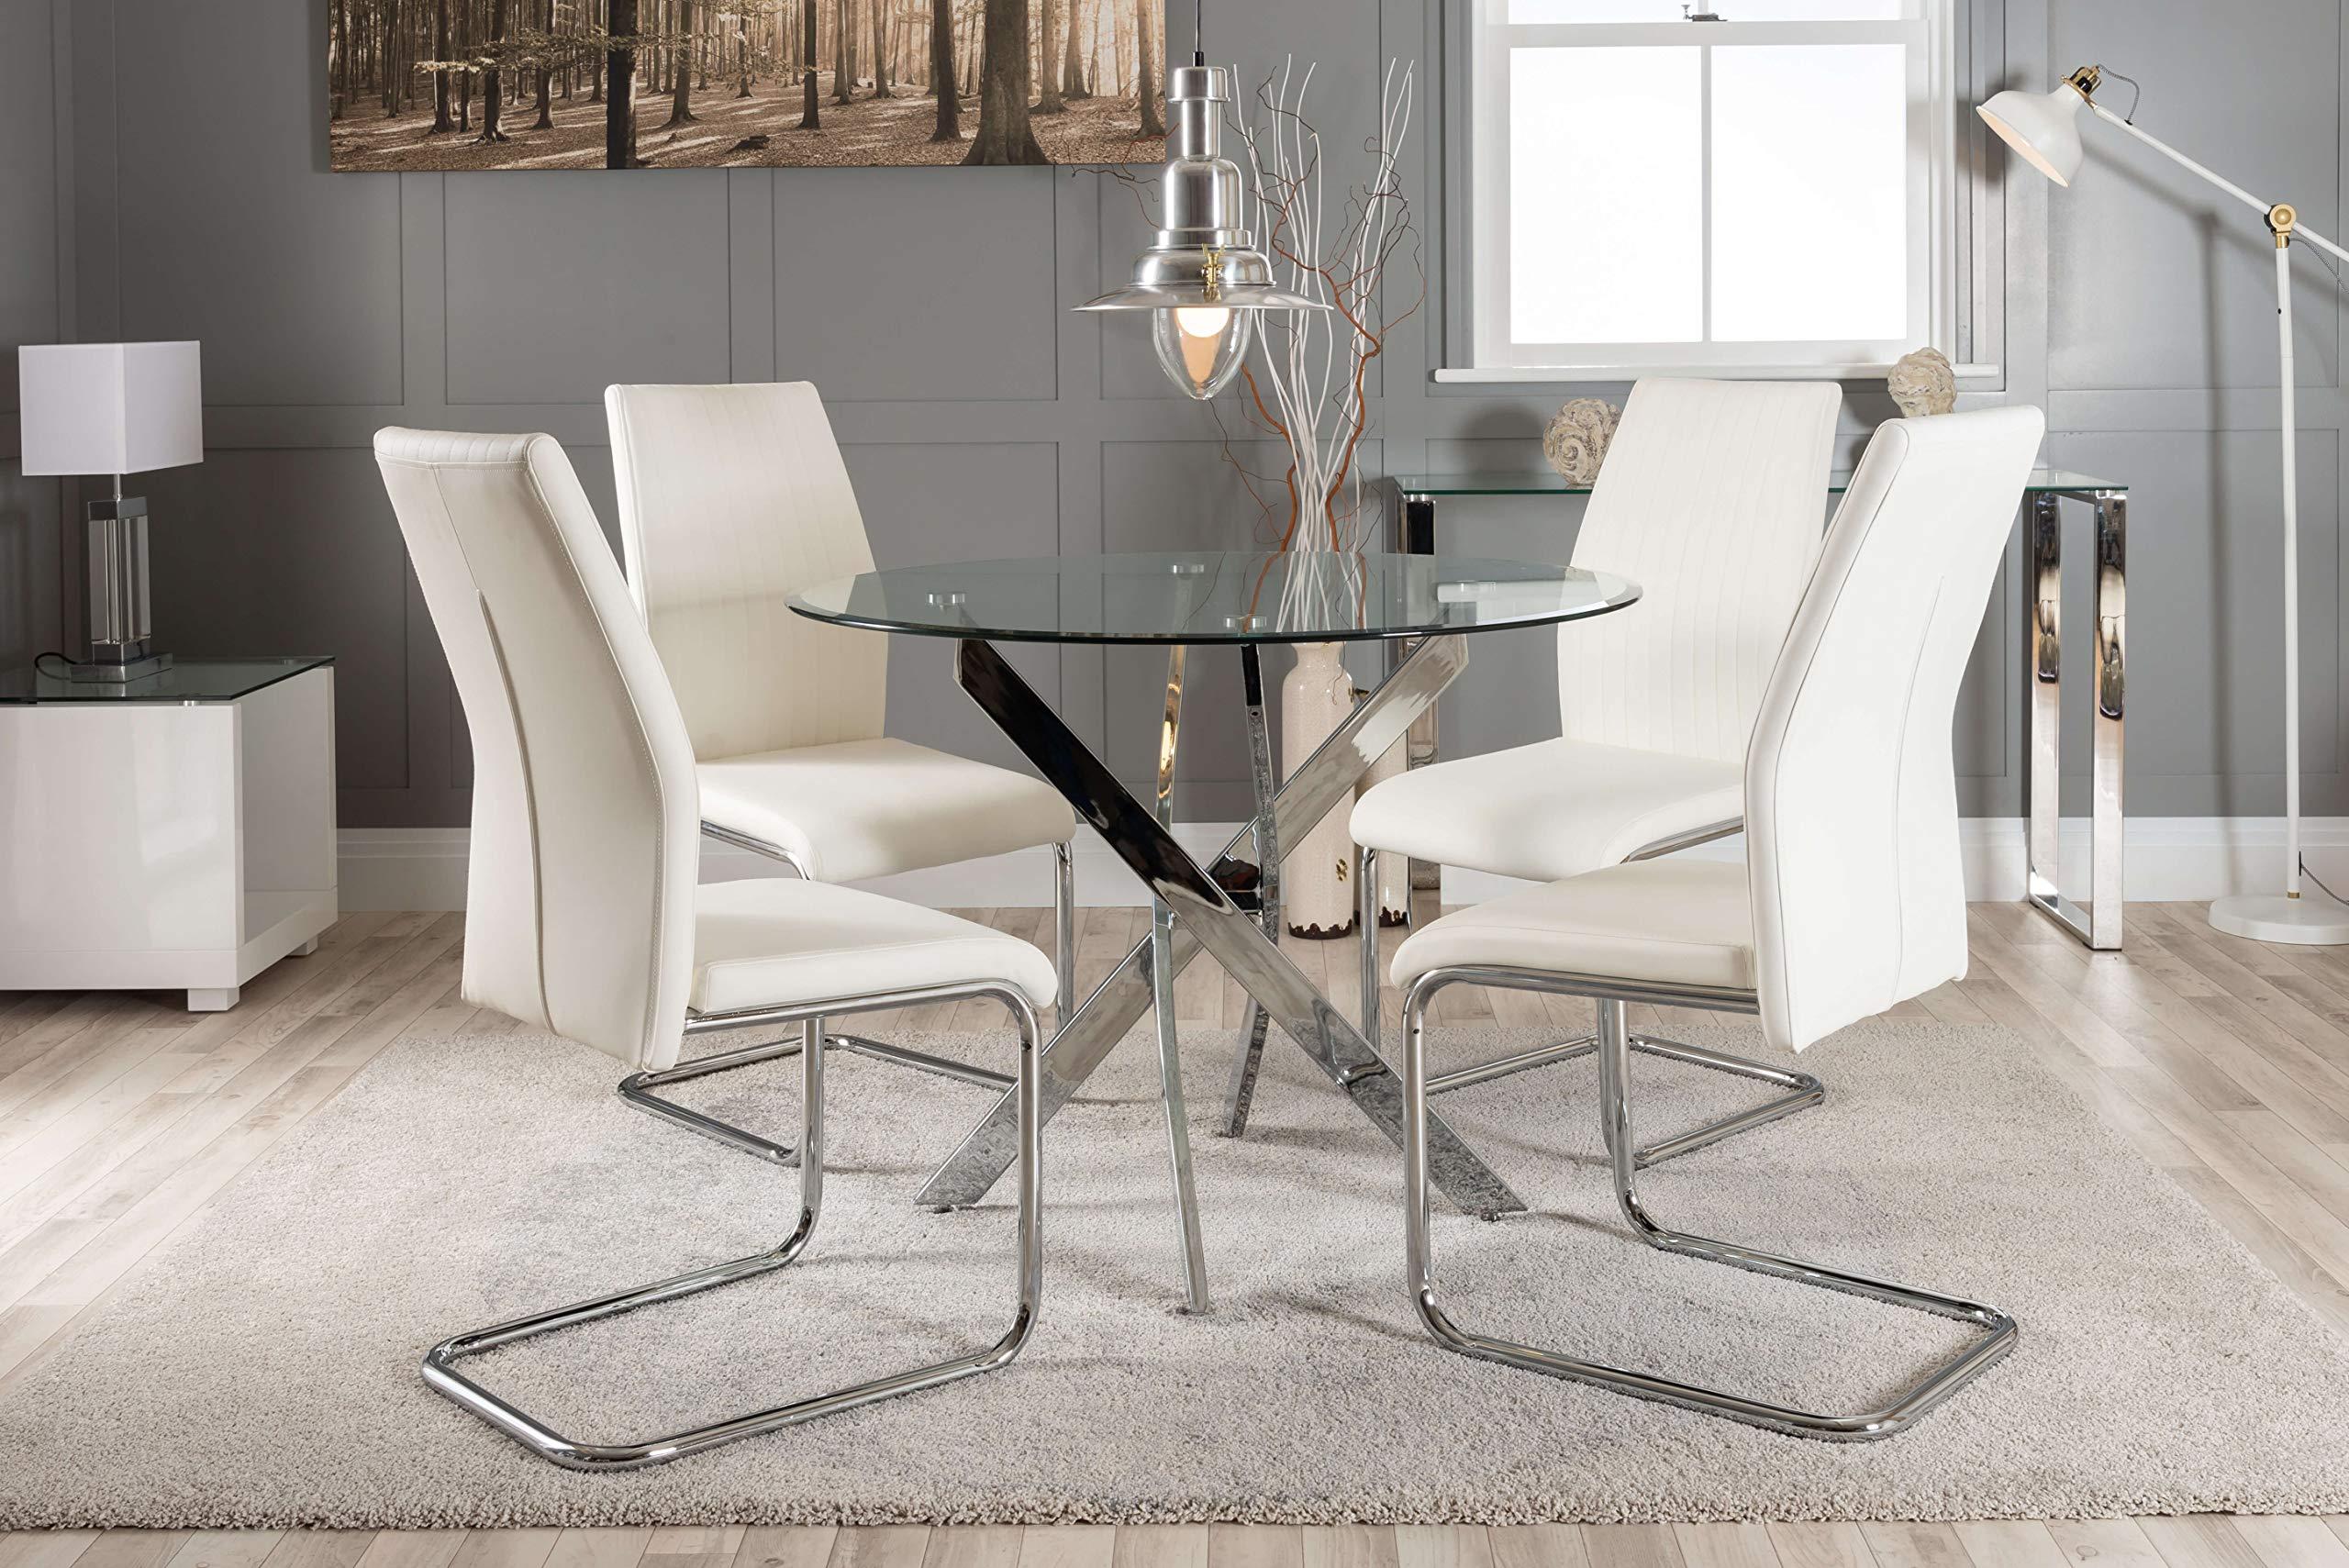 Furniturebox Uk Novara Chrome Metal Round Glass Dining Table And 4 Black White Lorenzo Dining Chairs 4 White Chairs Buy Online In Guam At Guam Desertcart Com Productid 57876833